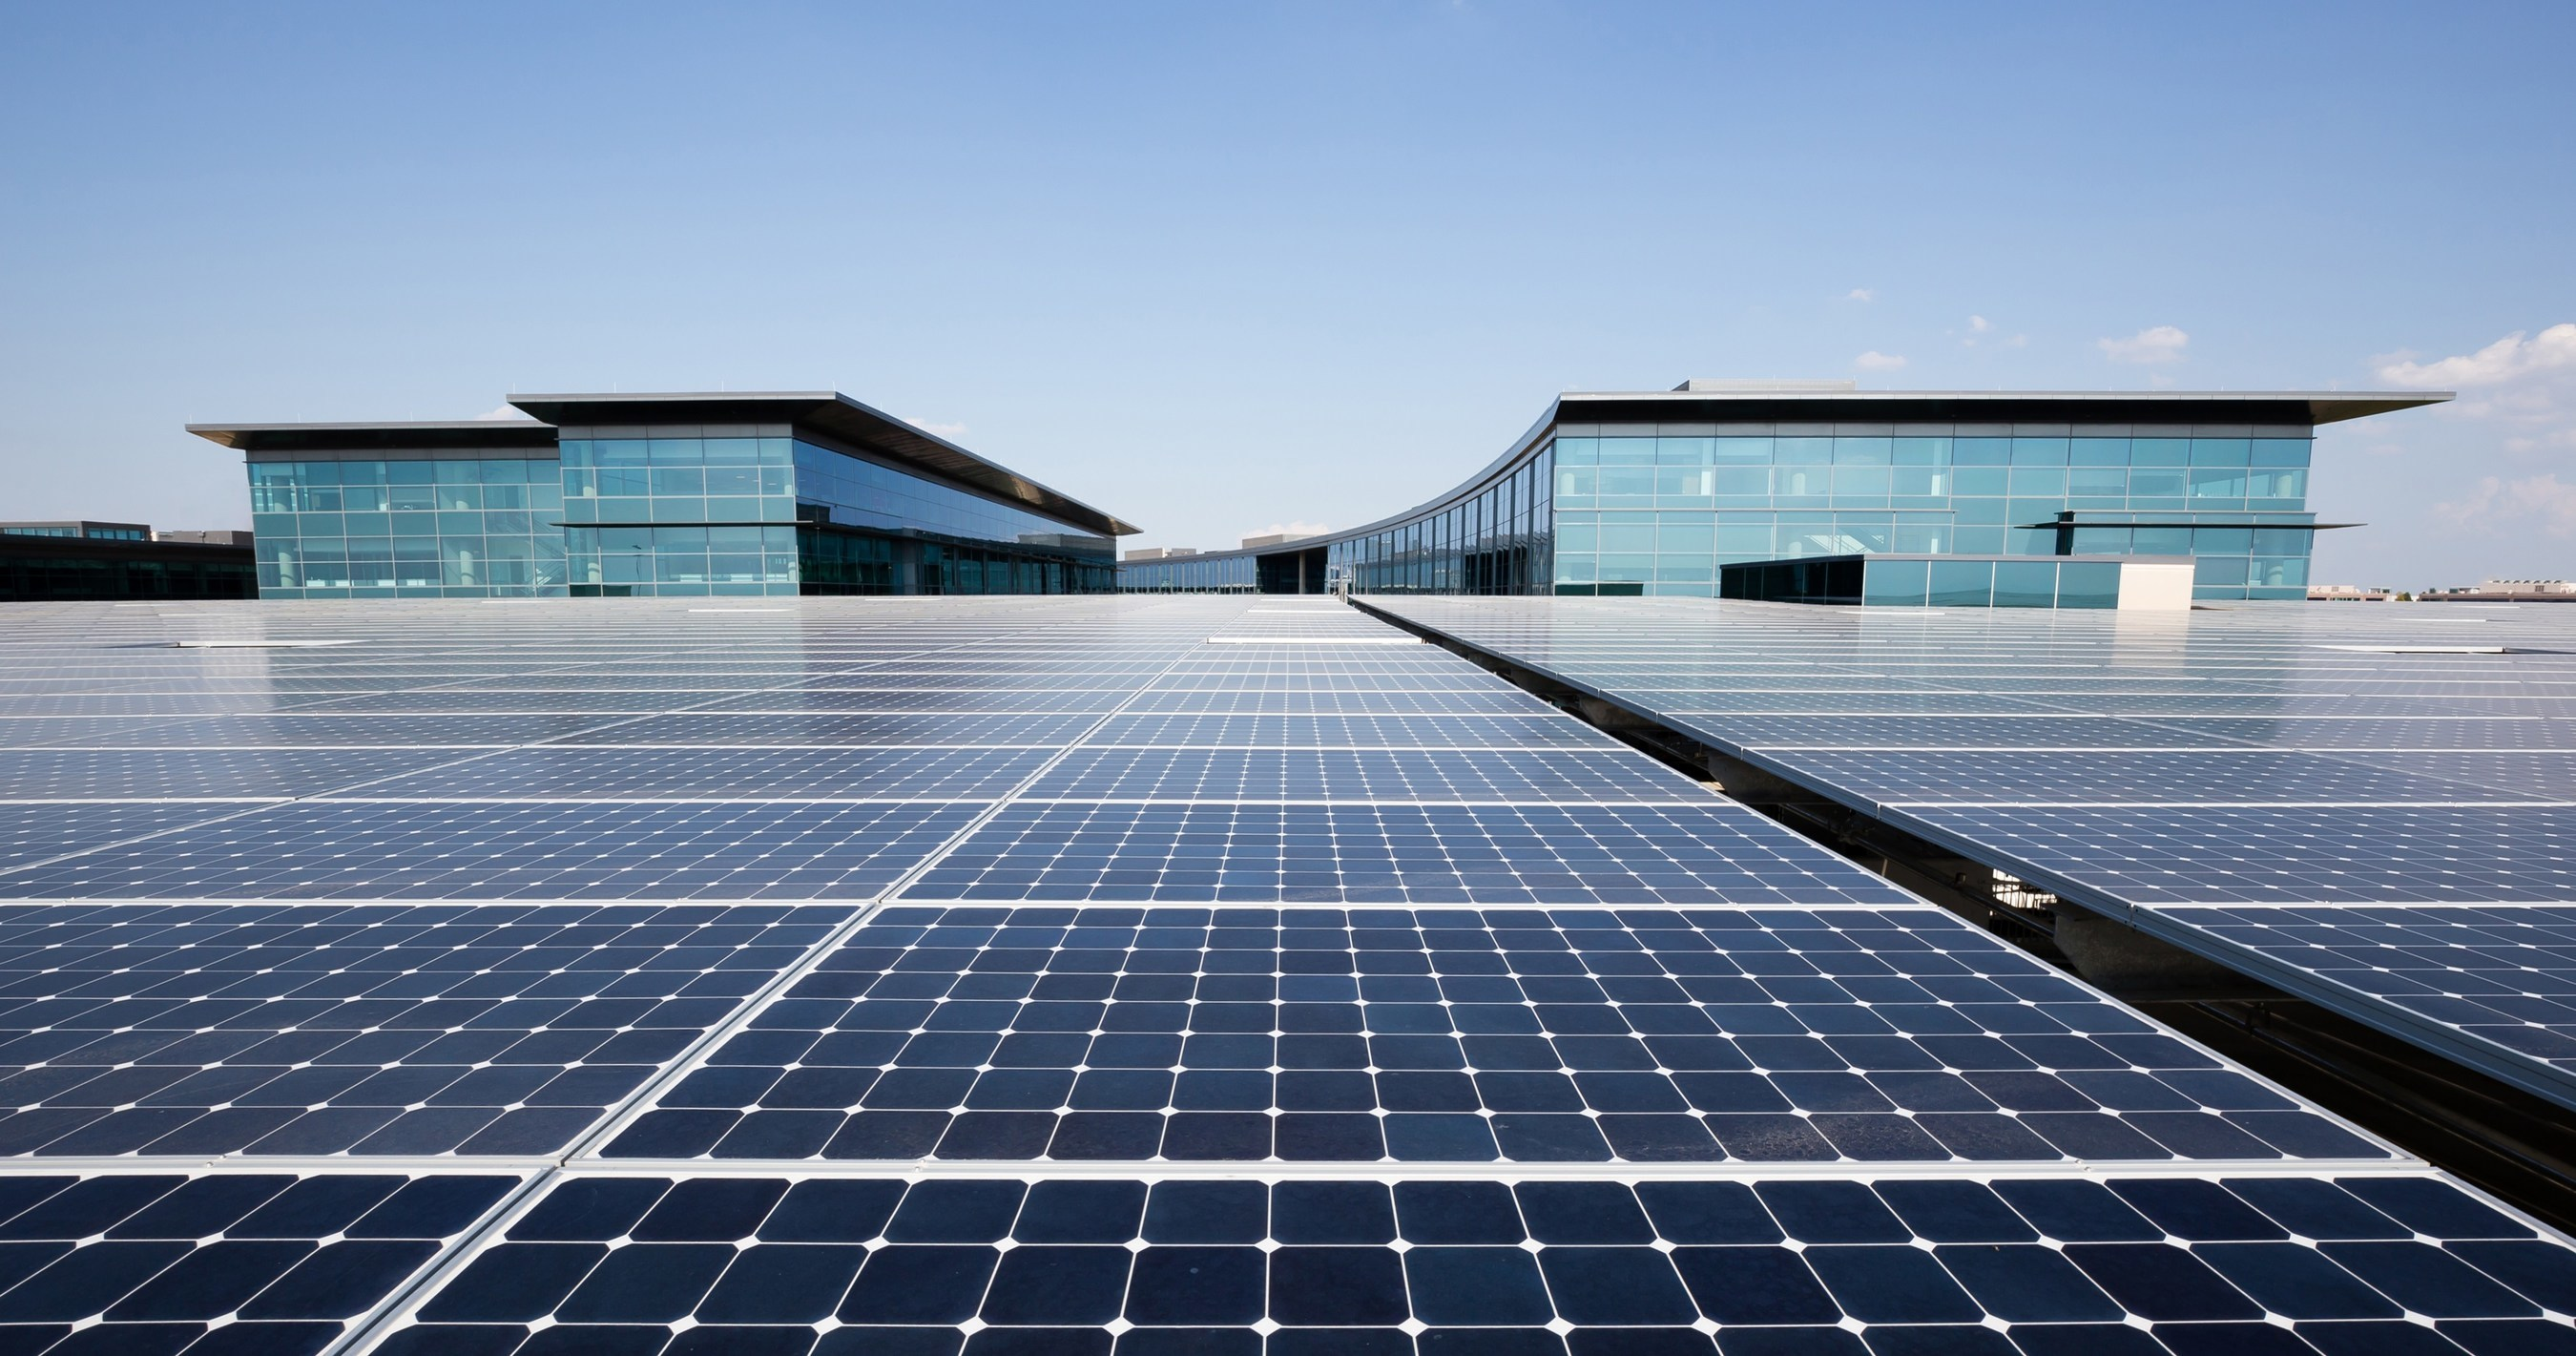 Sunpower Completes 8 79 Megawatt Solar Project At Toyota